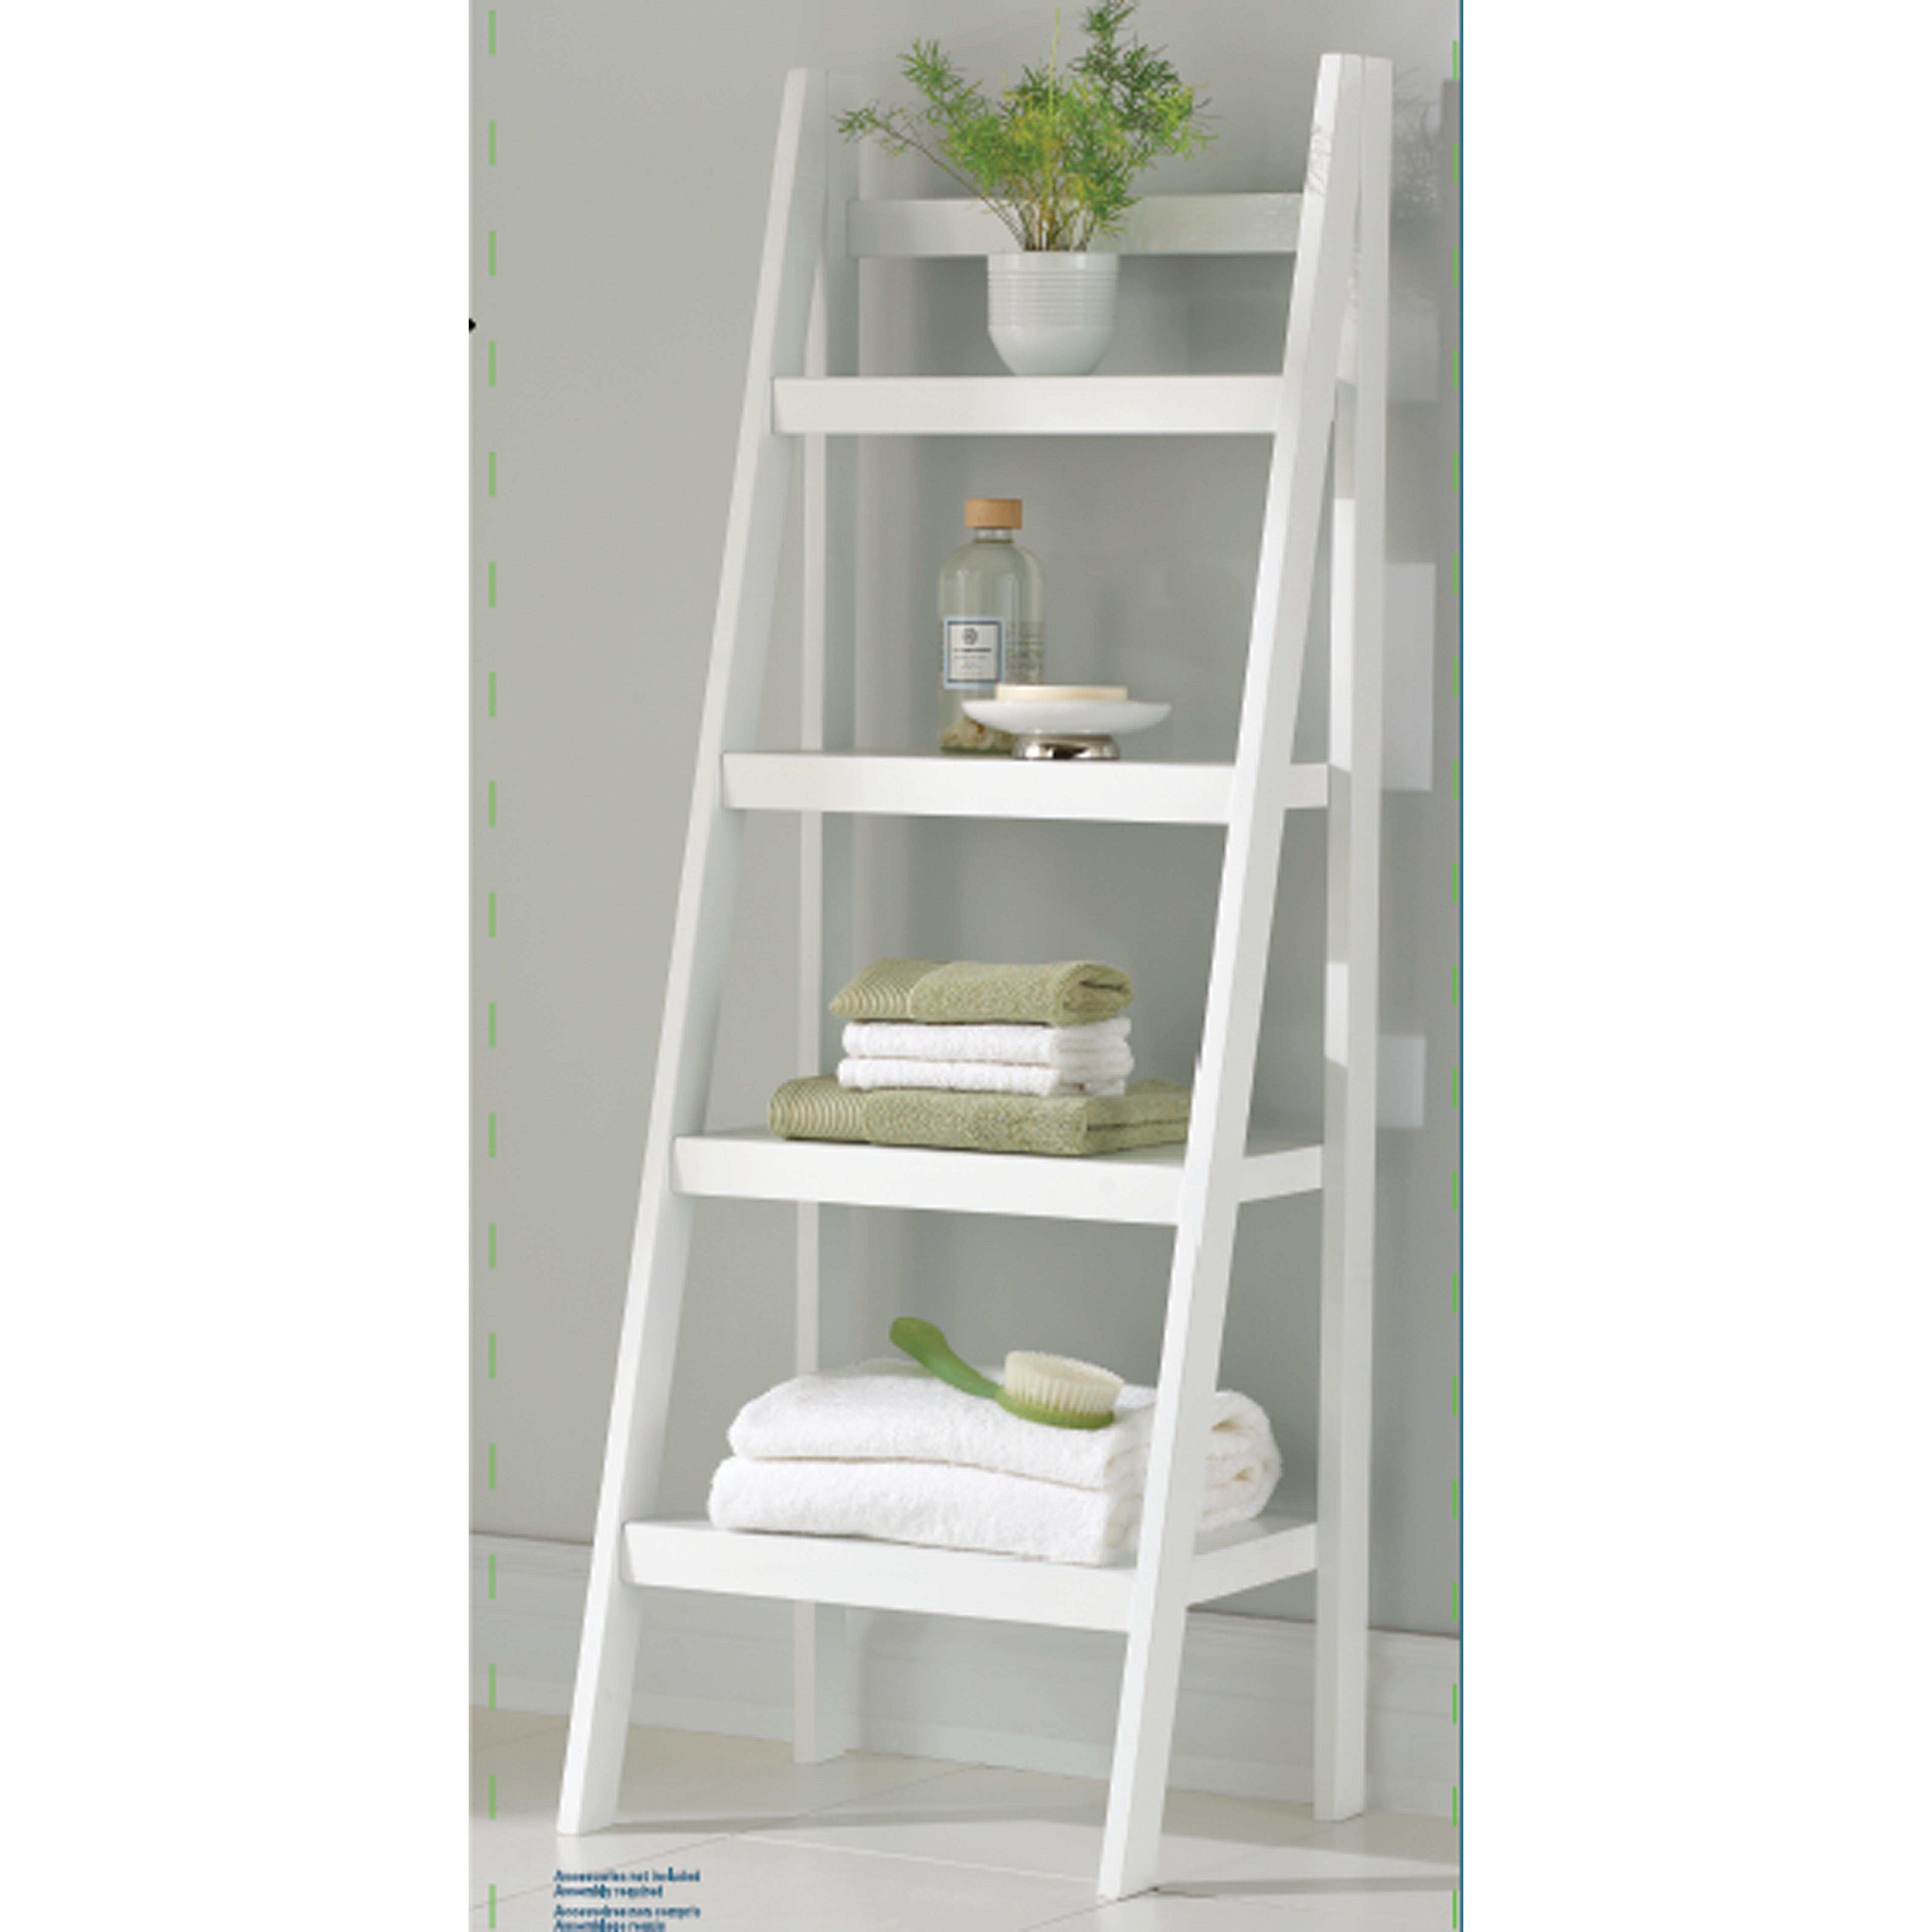 "Homestar 4 Shelf Ladder 46.8"" Bookcase & Reviews"